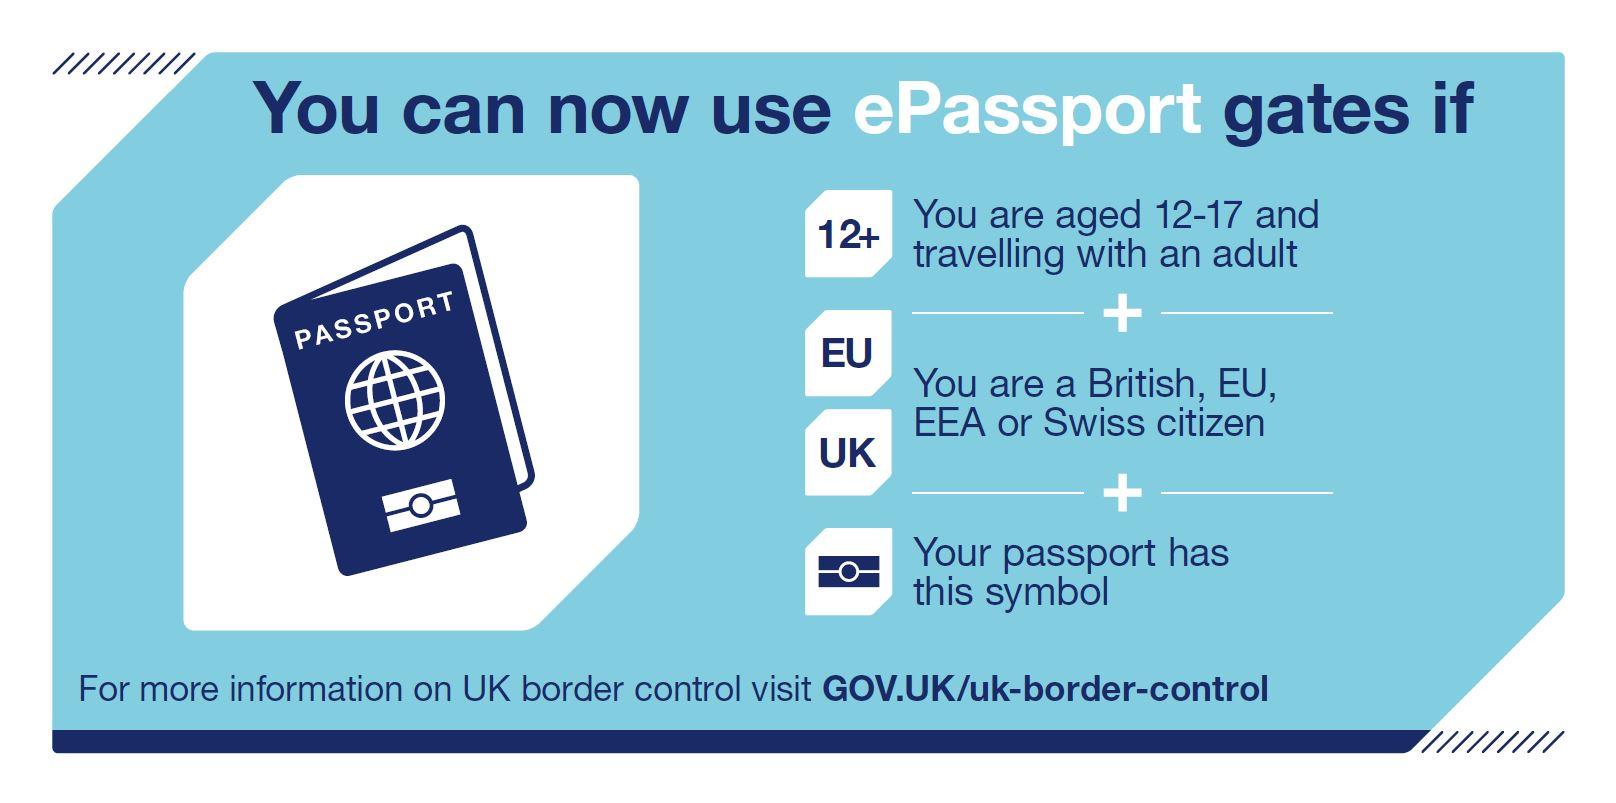 Baggage Reclaim, Lost Baggage And Customs After You Travel Birmingham  Airport Birmingham Airport Website Metv Passports For Prague